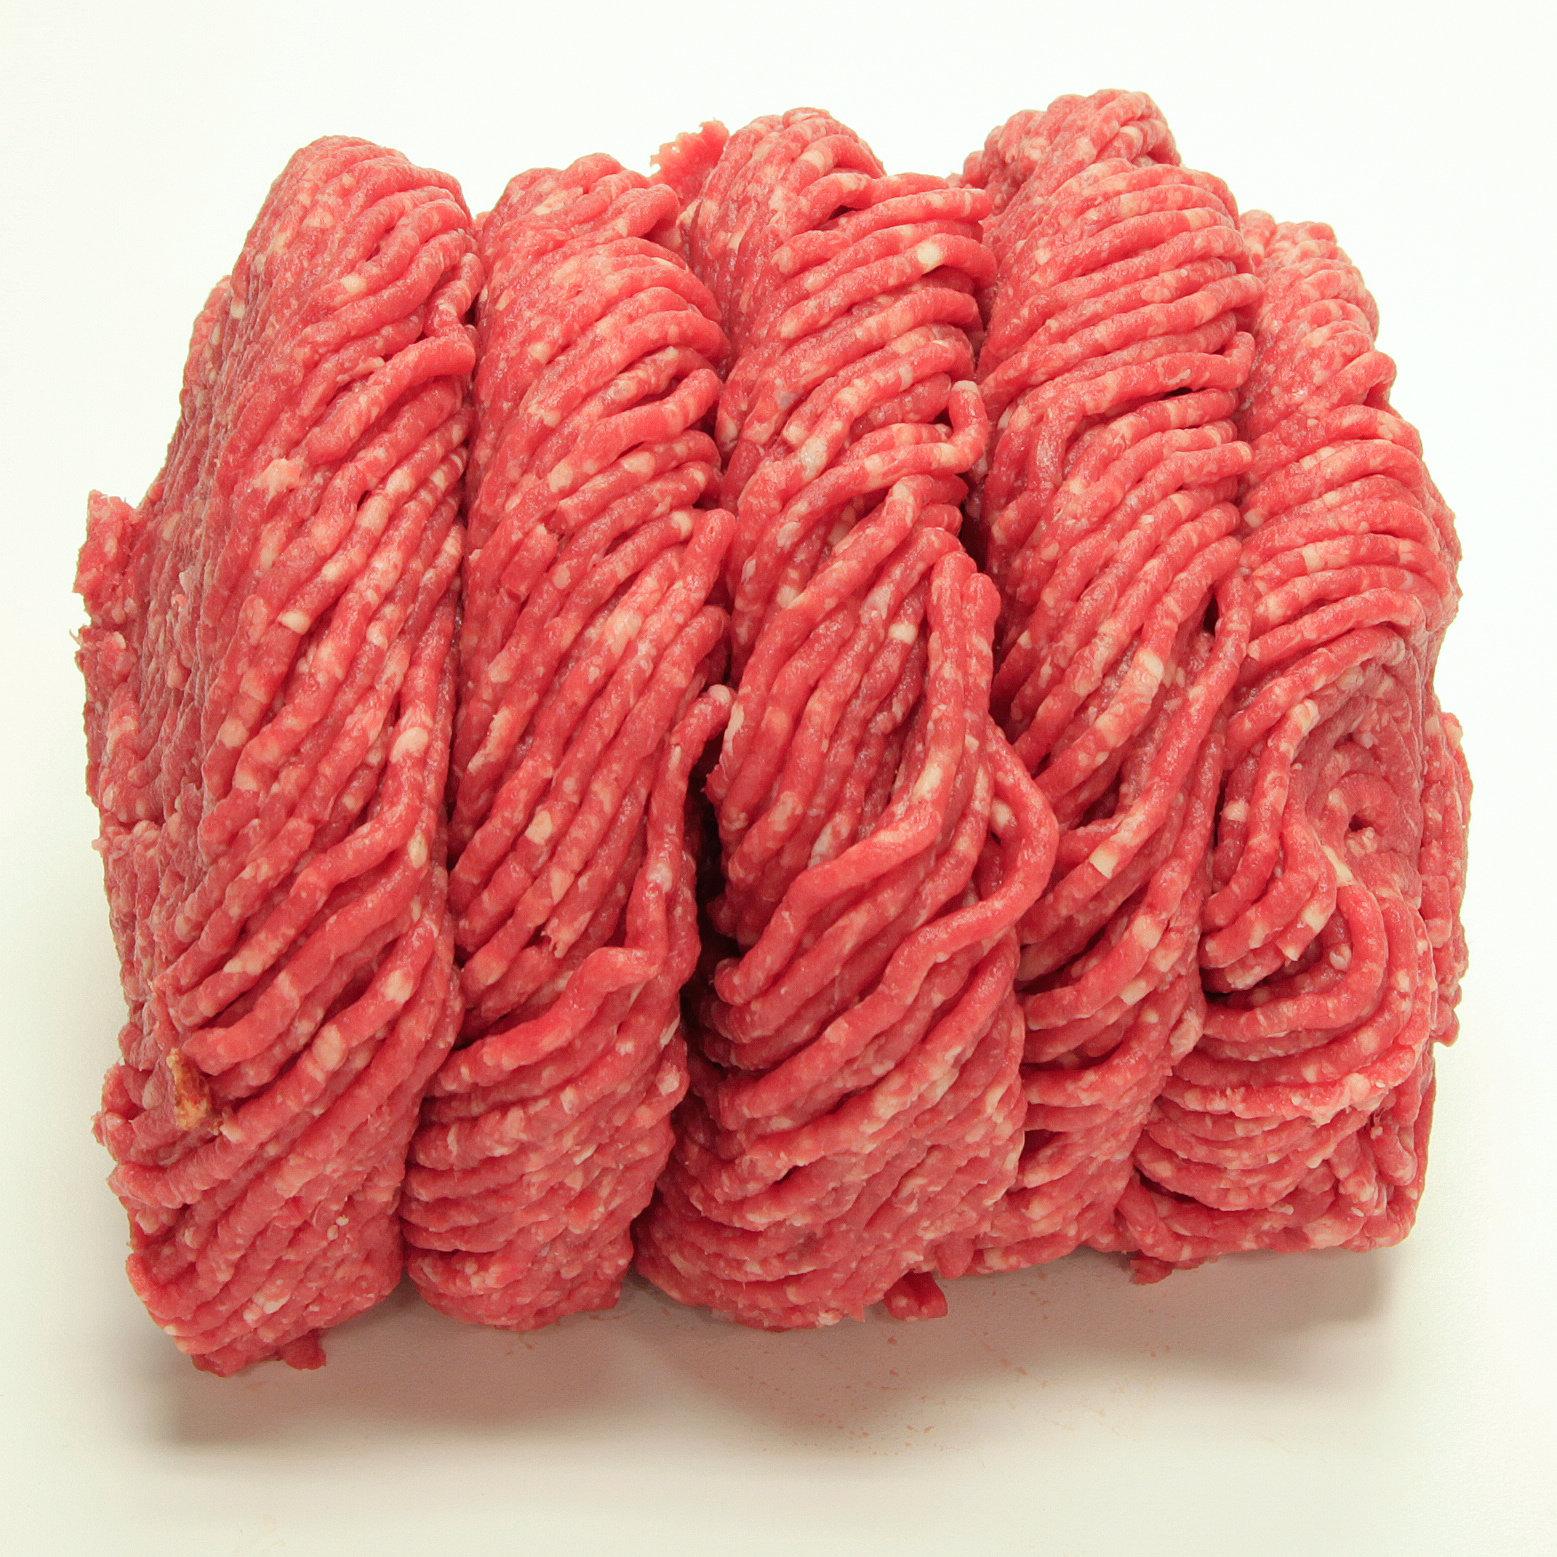 Harris Ranch, USDA Choice Burger Blend Ground Beef, 1 lb. 00084